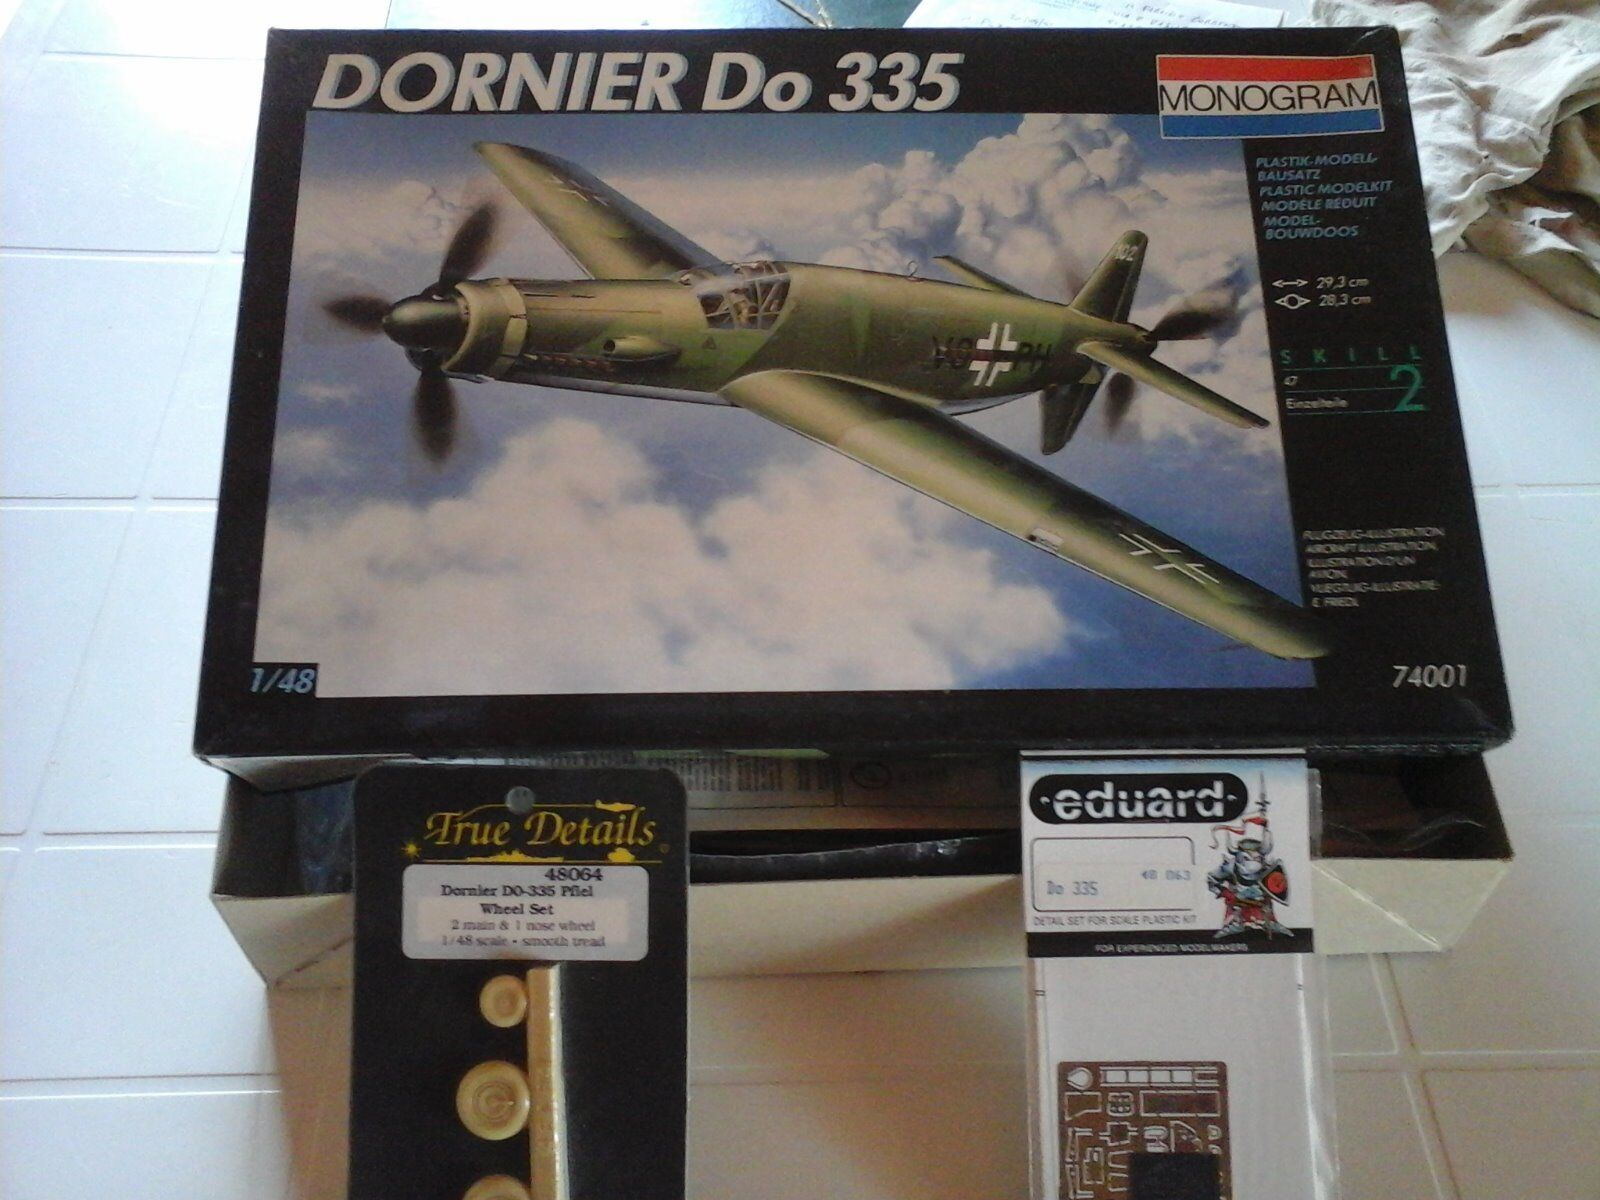 DORNIER DO 335  1 48 SCALE MODEL MONOGRAM+WHEEL SET RESIN PARTS+PHOTOETCHED EDUA